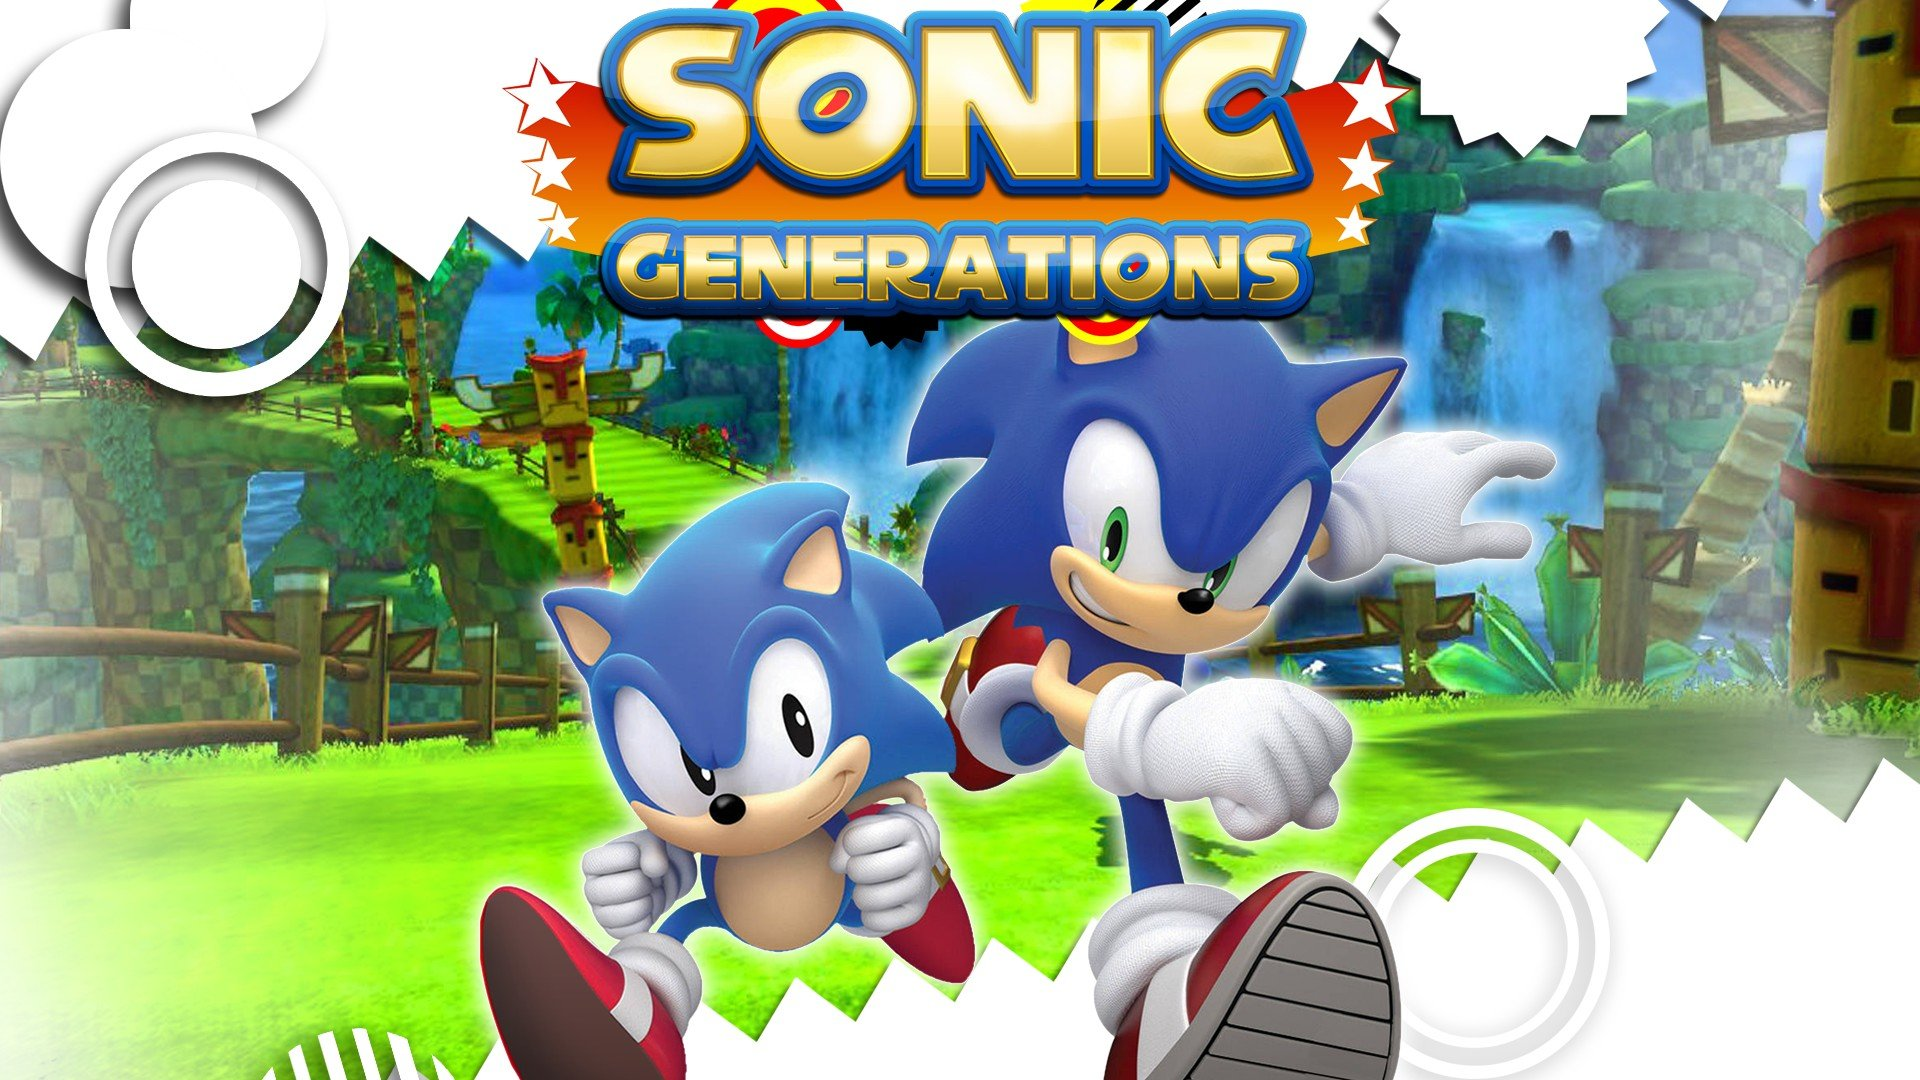 Sonic The Hedgehog Wallpapers 1920x1080 Full Hd 1080p Desktop